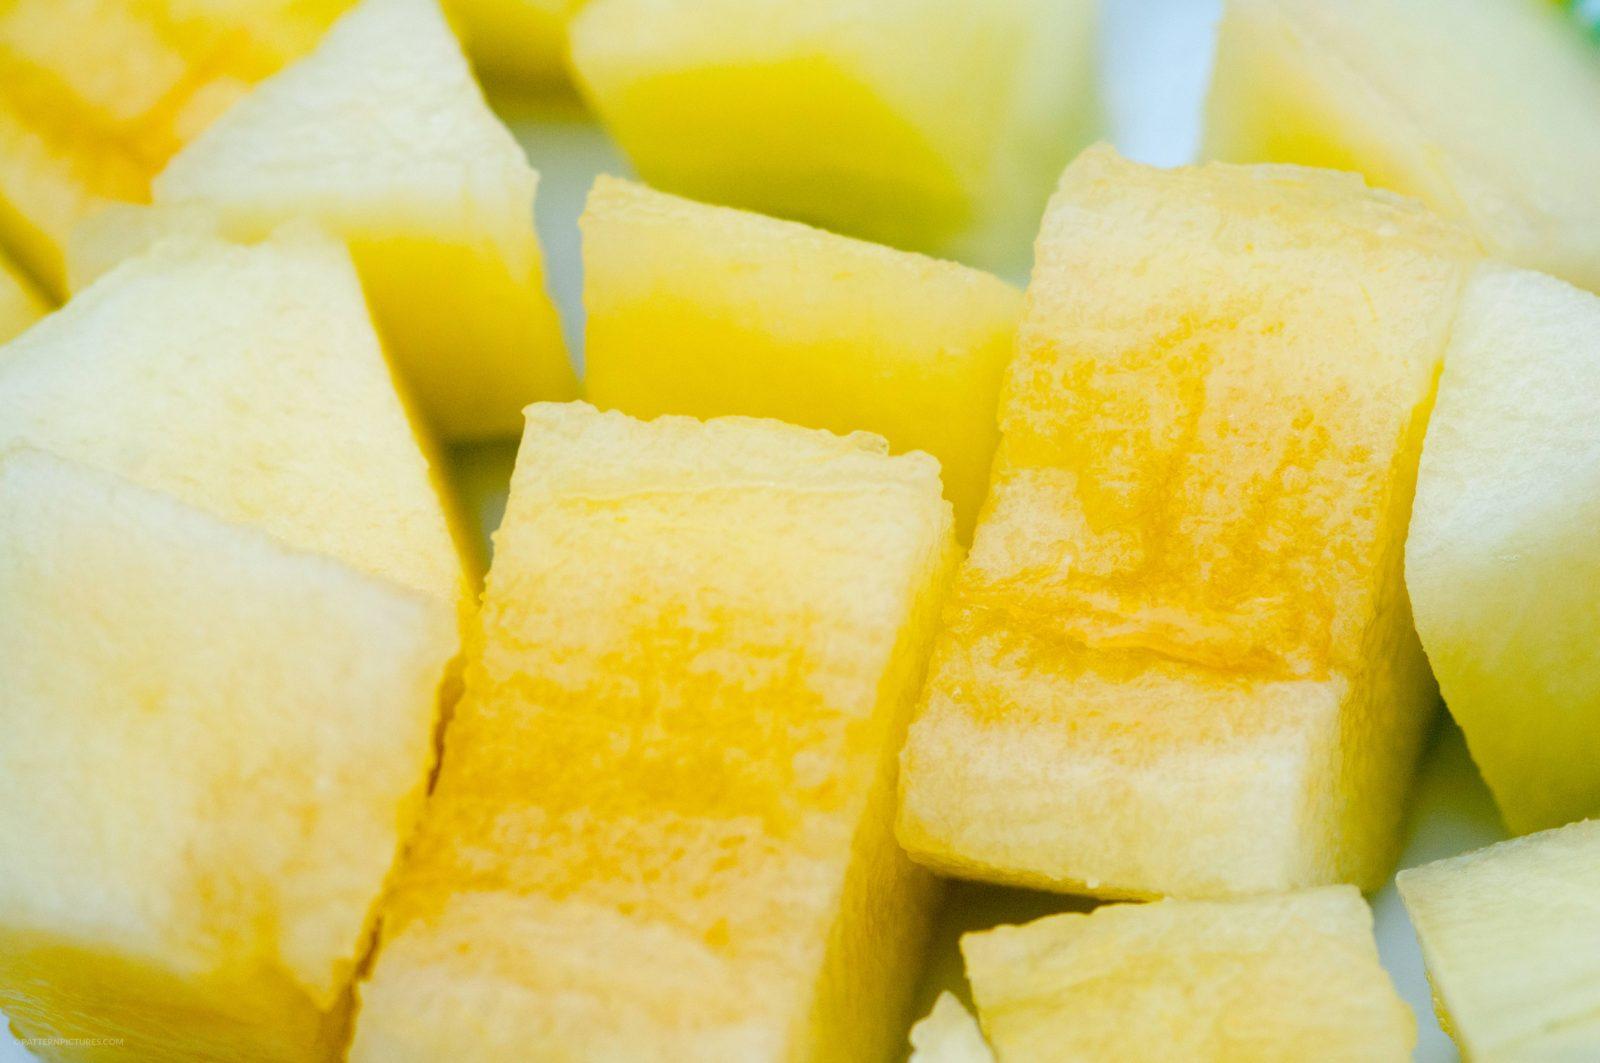 Pieces of honeydew melon pattern